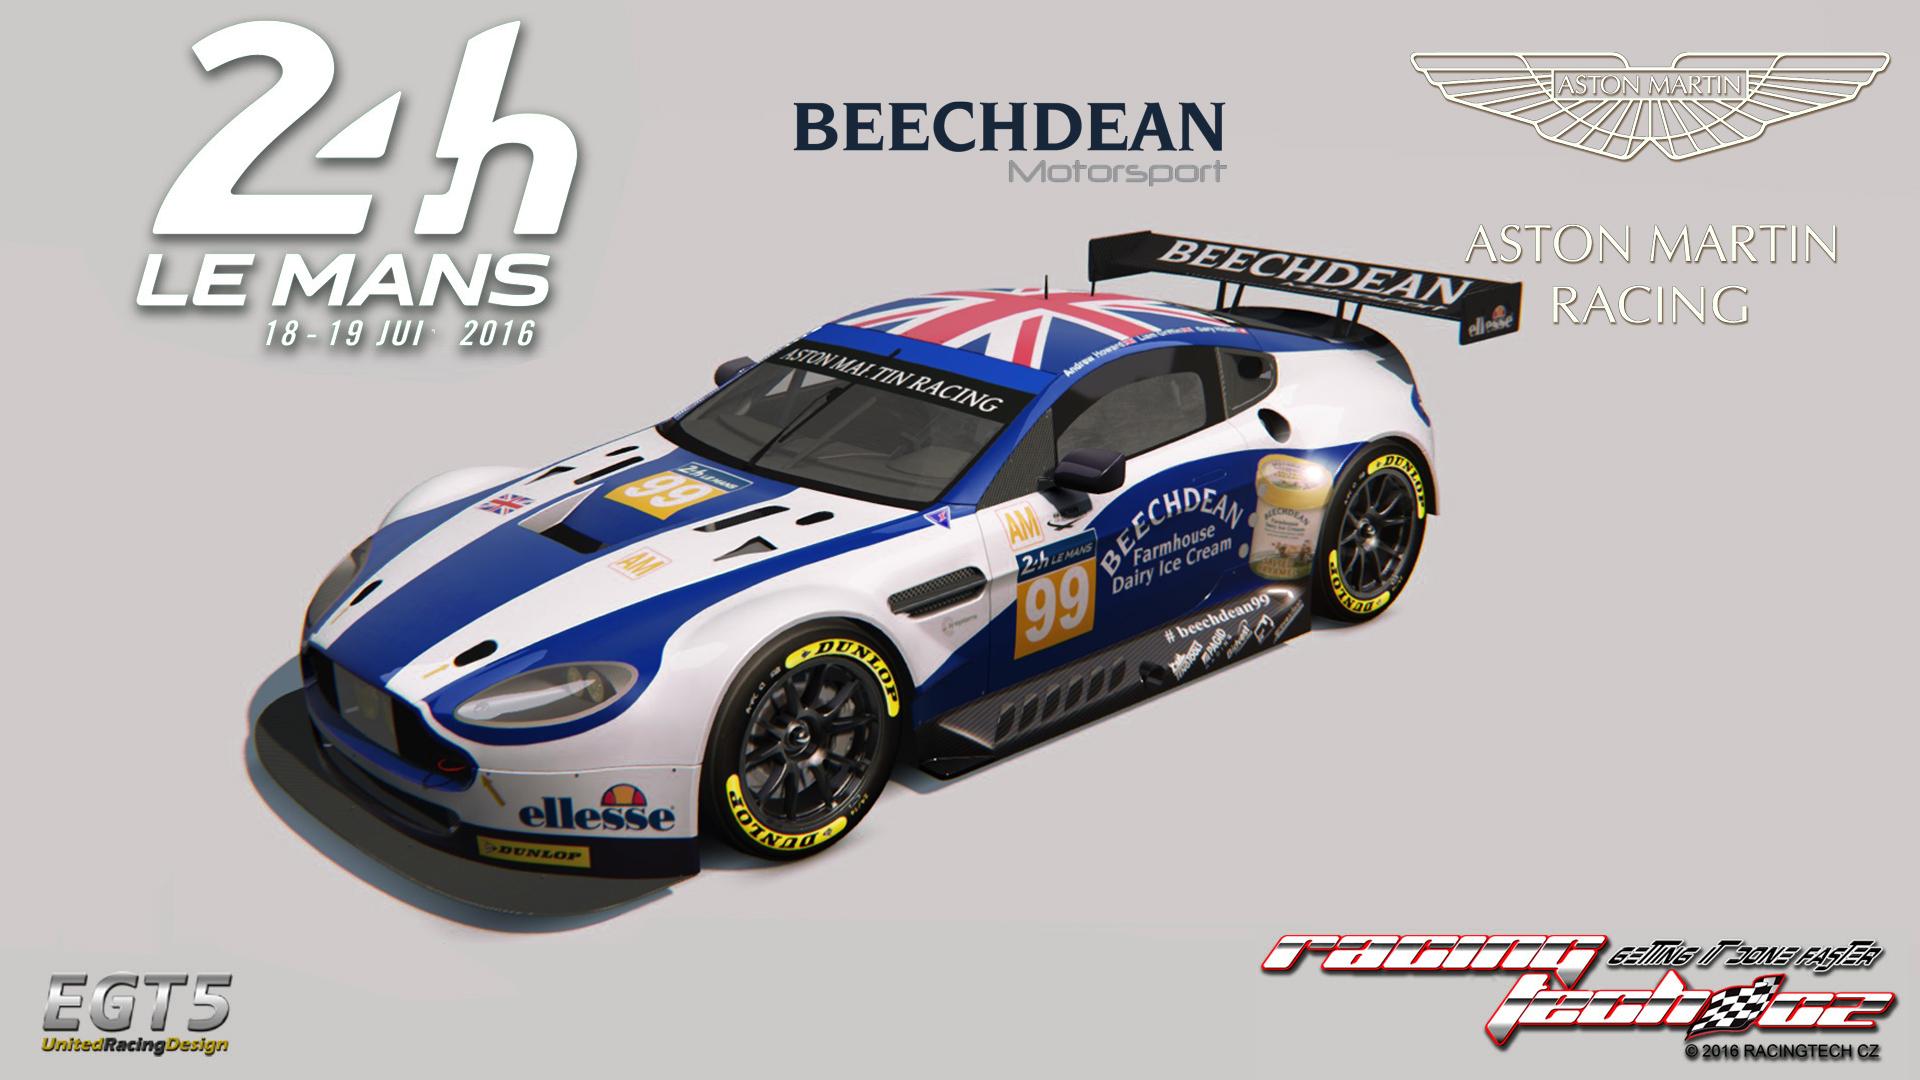 Beechdean motorsport.jpg